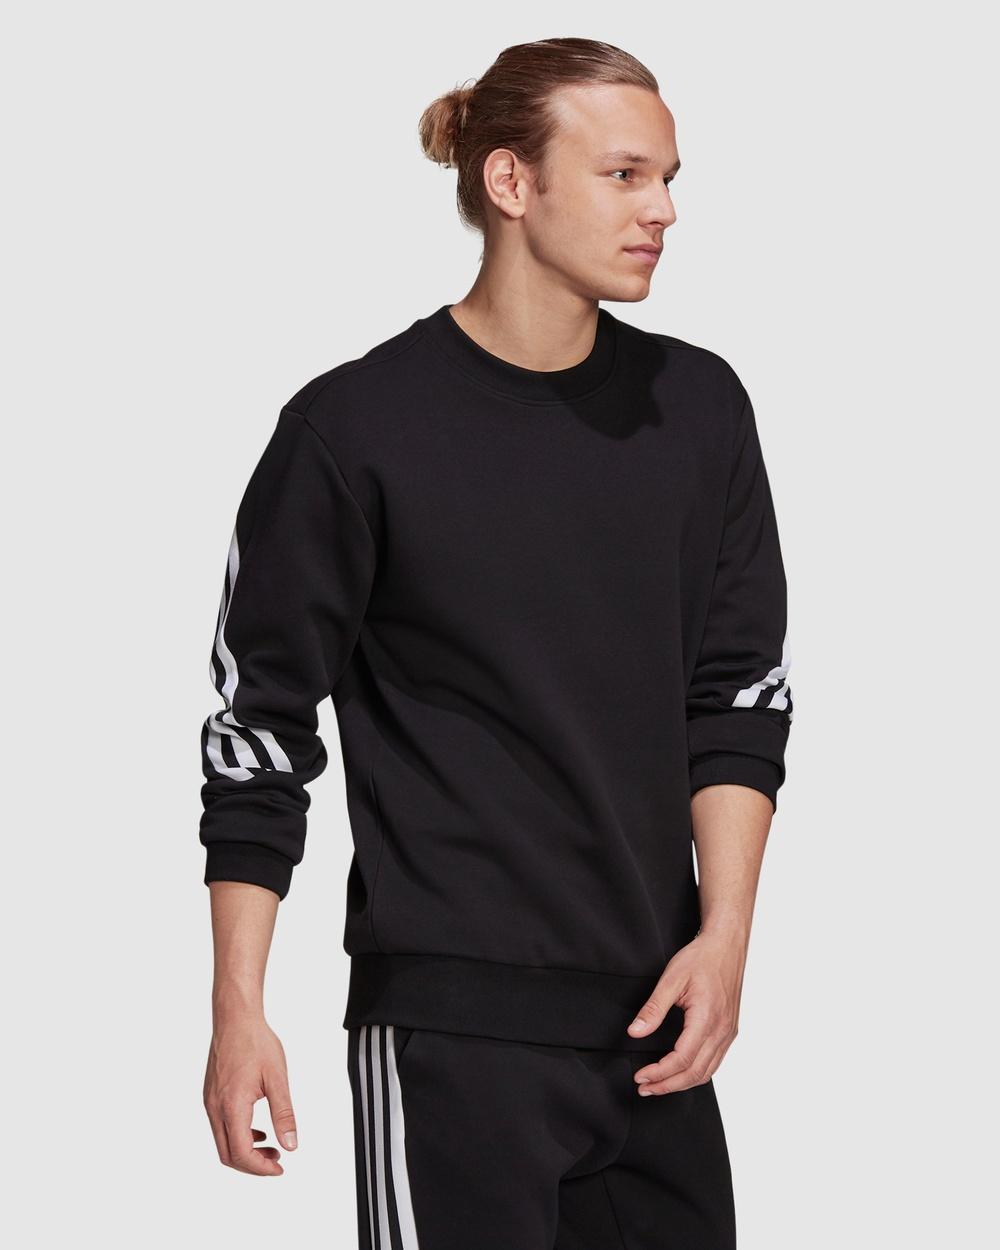 adidas Performance Sportswear Future Icons 3 Stripes Sweatshirt Long Sleeve T-Shirts Black 3-Stripes